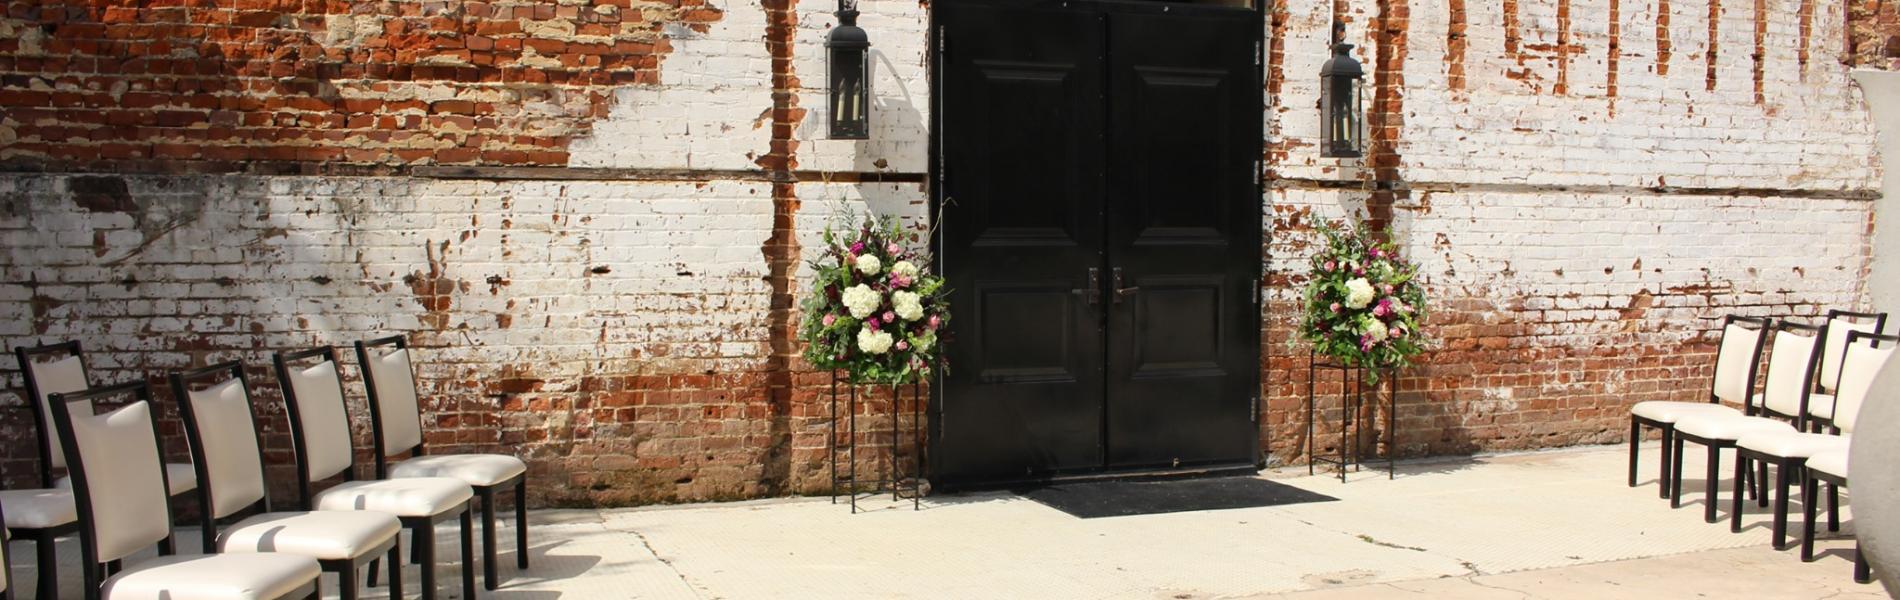 James Allen Plaza set up for a wedding